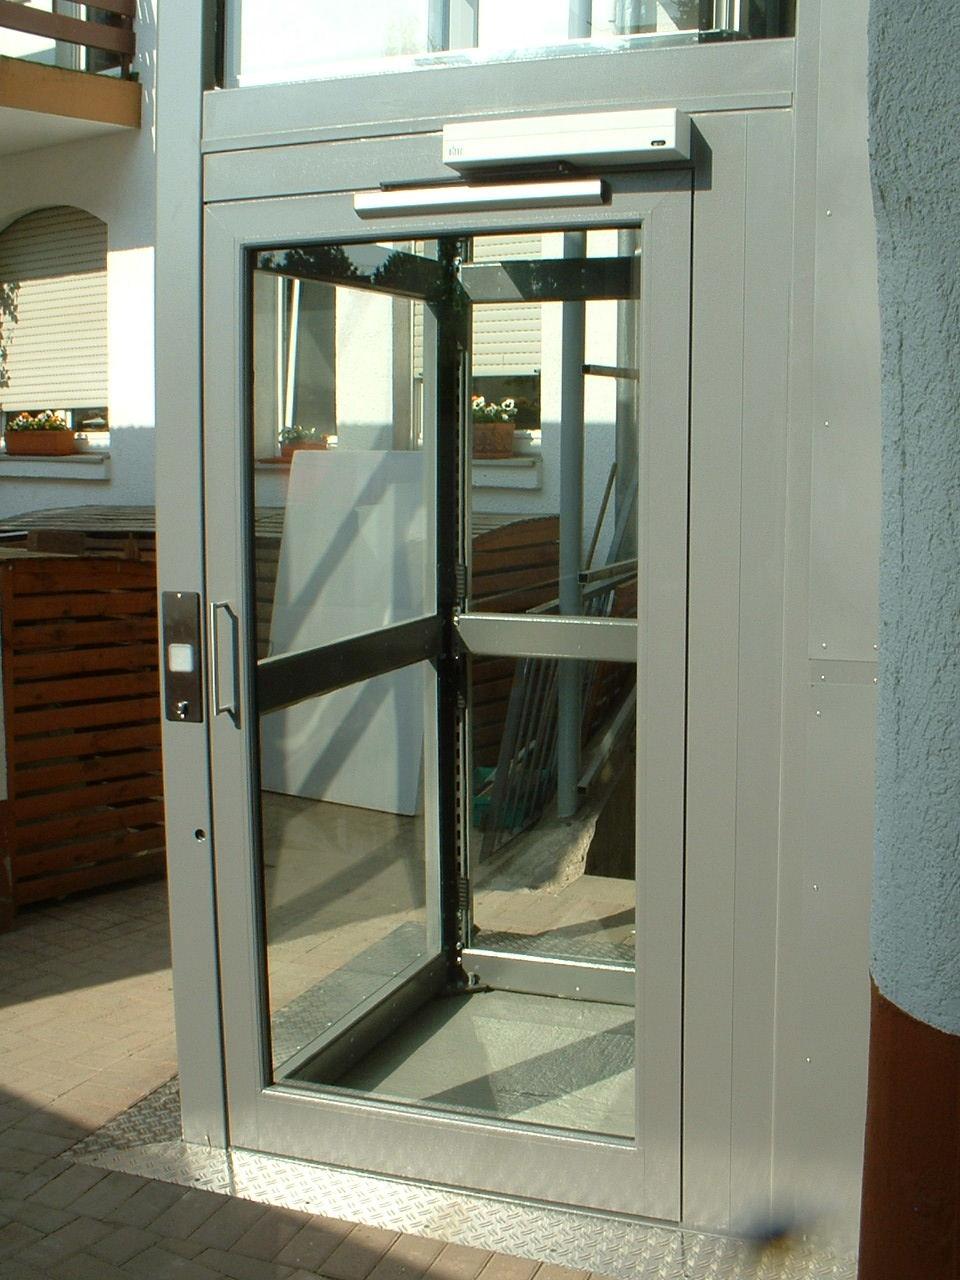 Zugang zum Außenaufzug